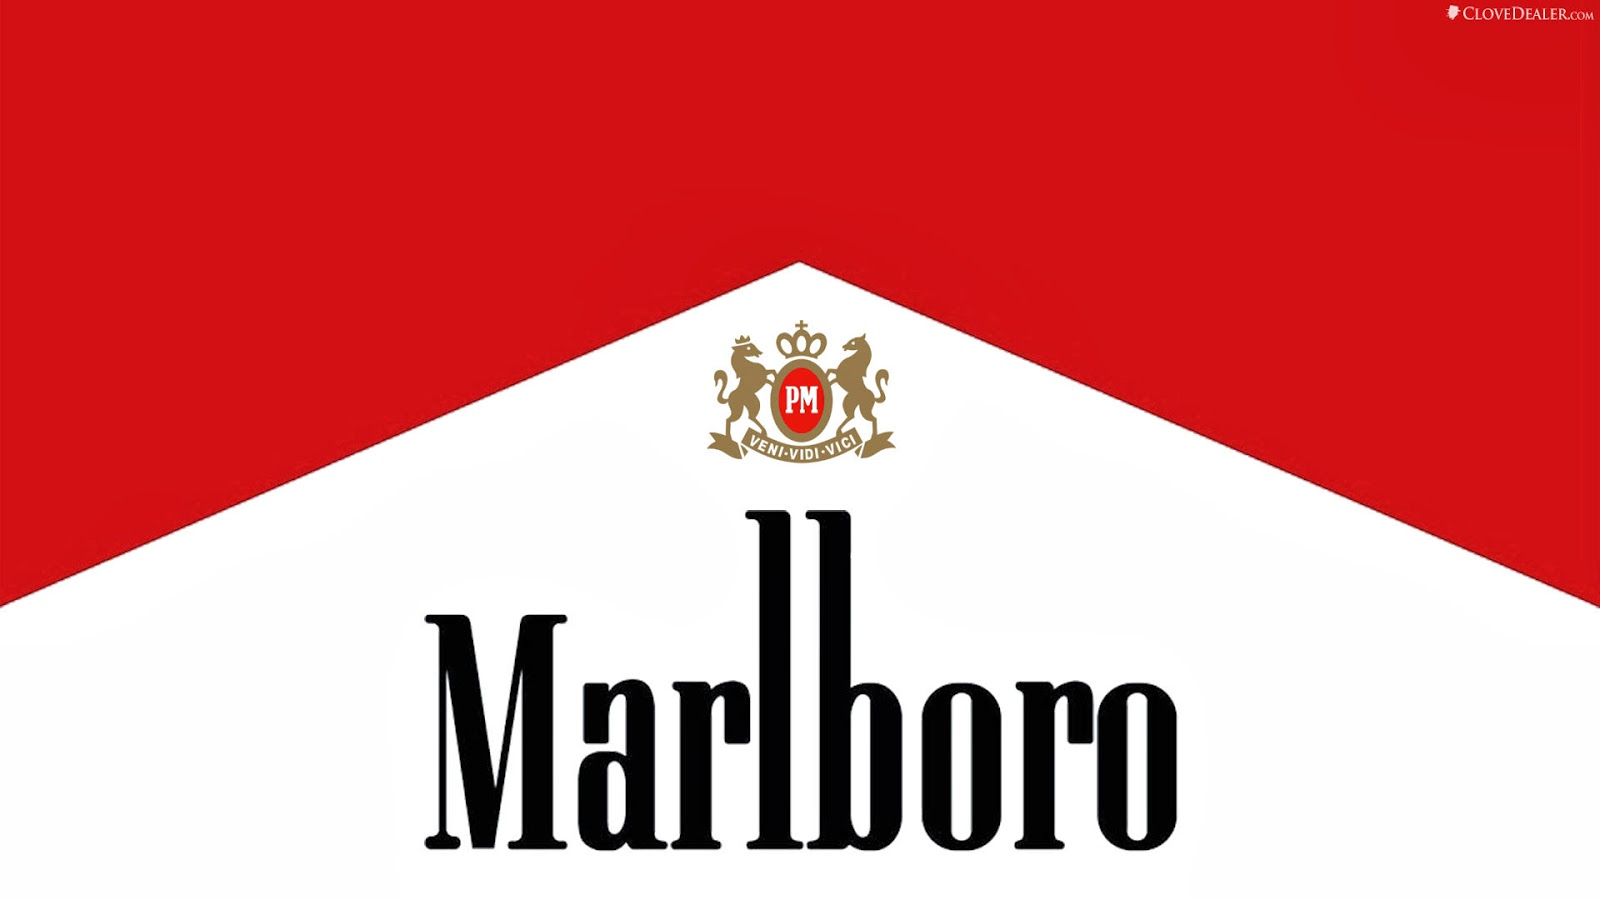 Marlboro logo wallpapers HD